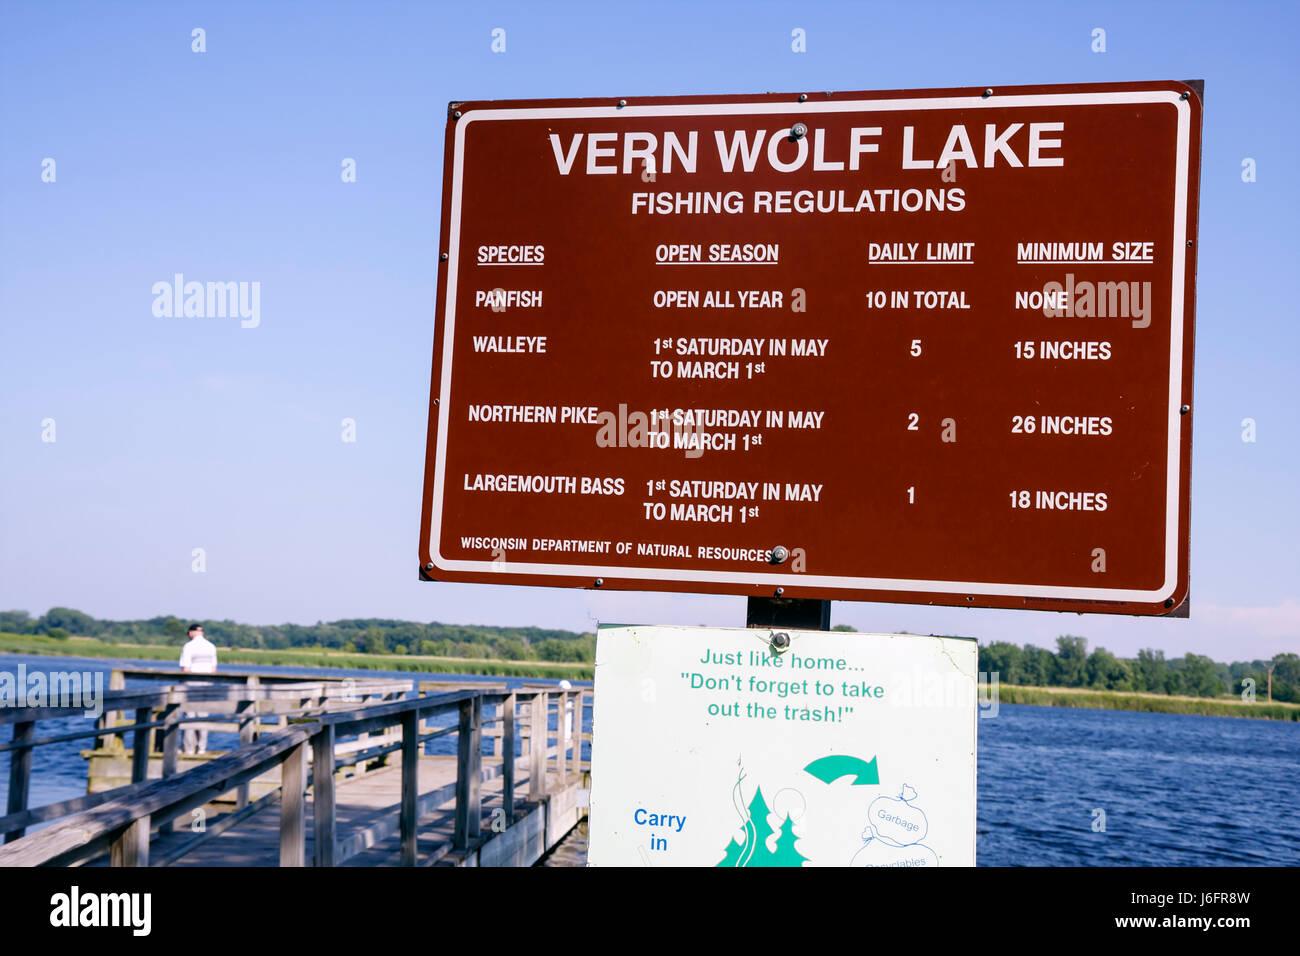 Wisconsin Kenosha Kansasville Richard Bong State Recreation Area Vern Wolf Lake fishing sign regulations season - Stock Image